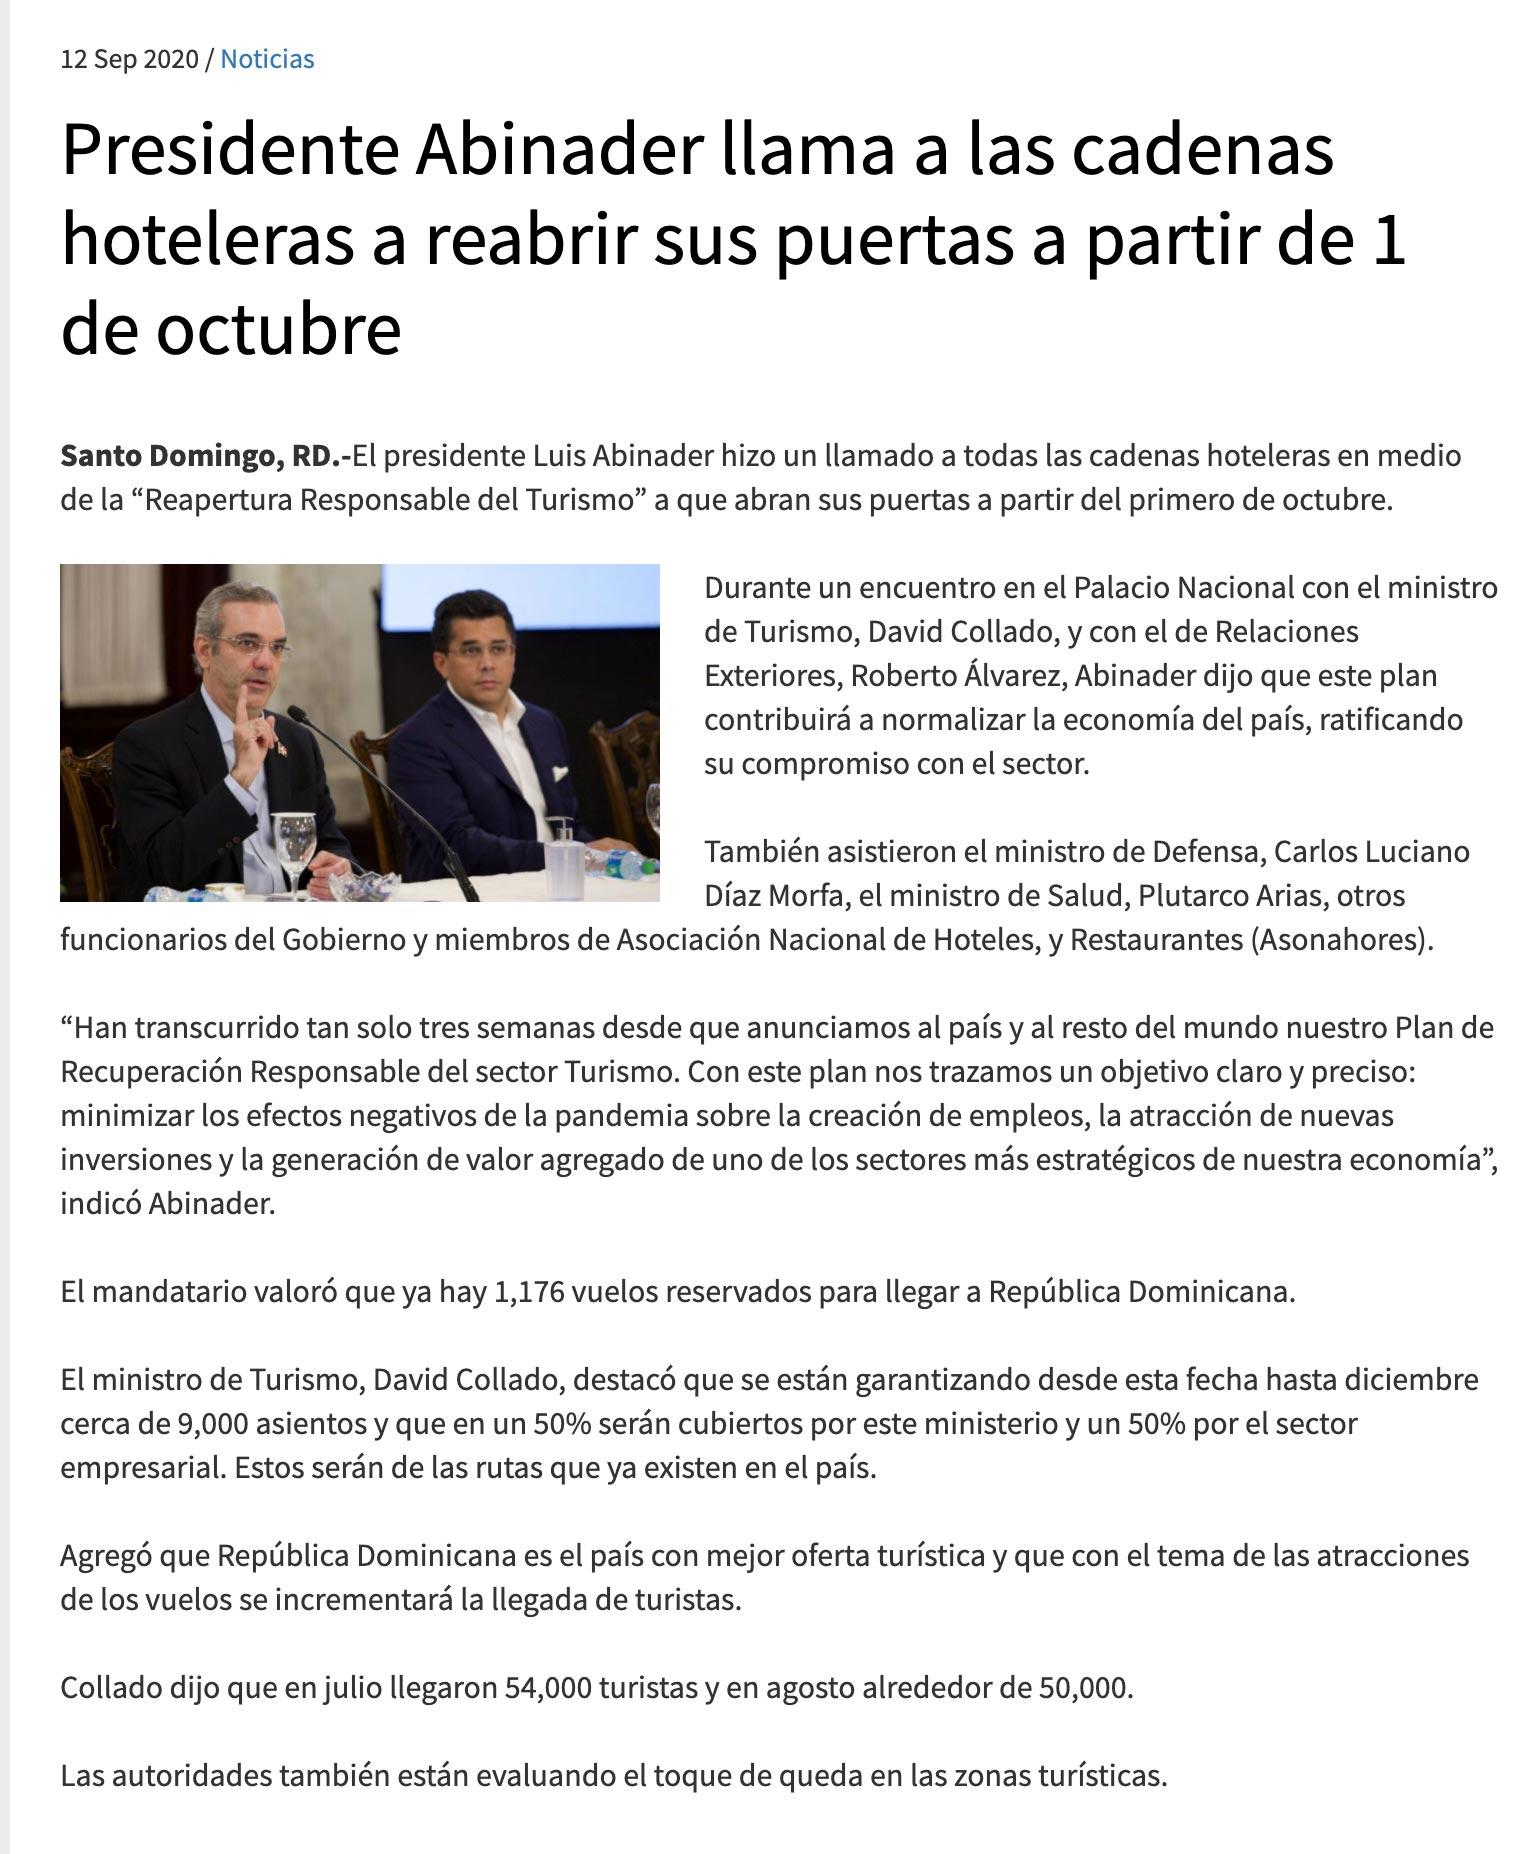 Covid-19 Tourism News - Punta Cana, Dominican Republic